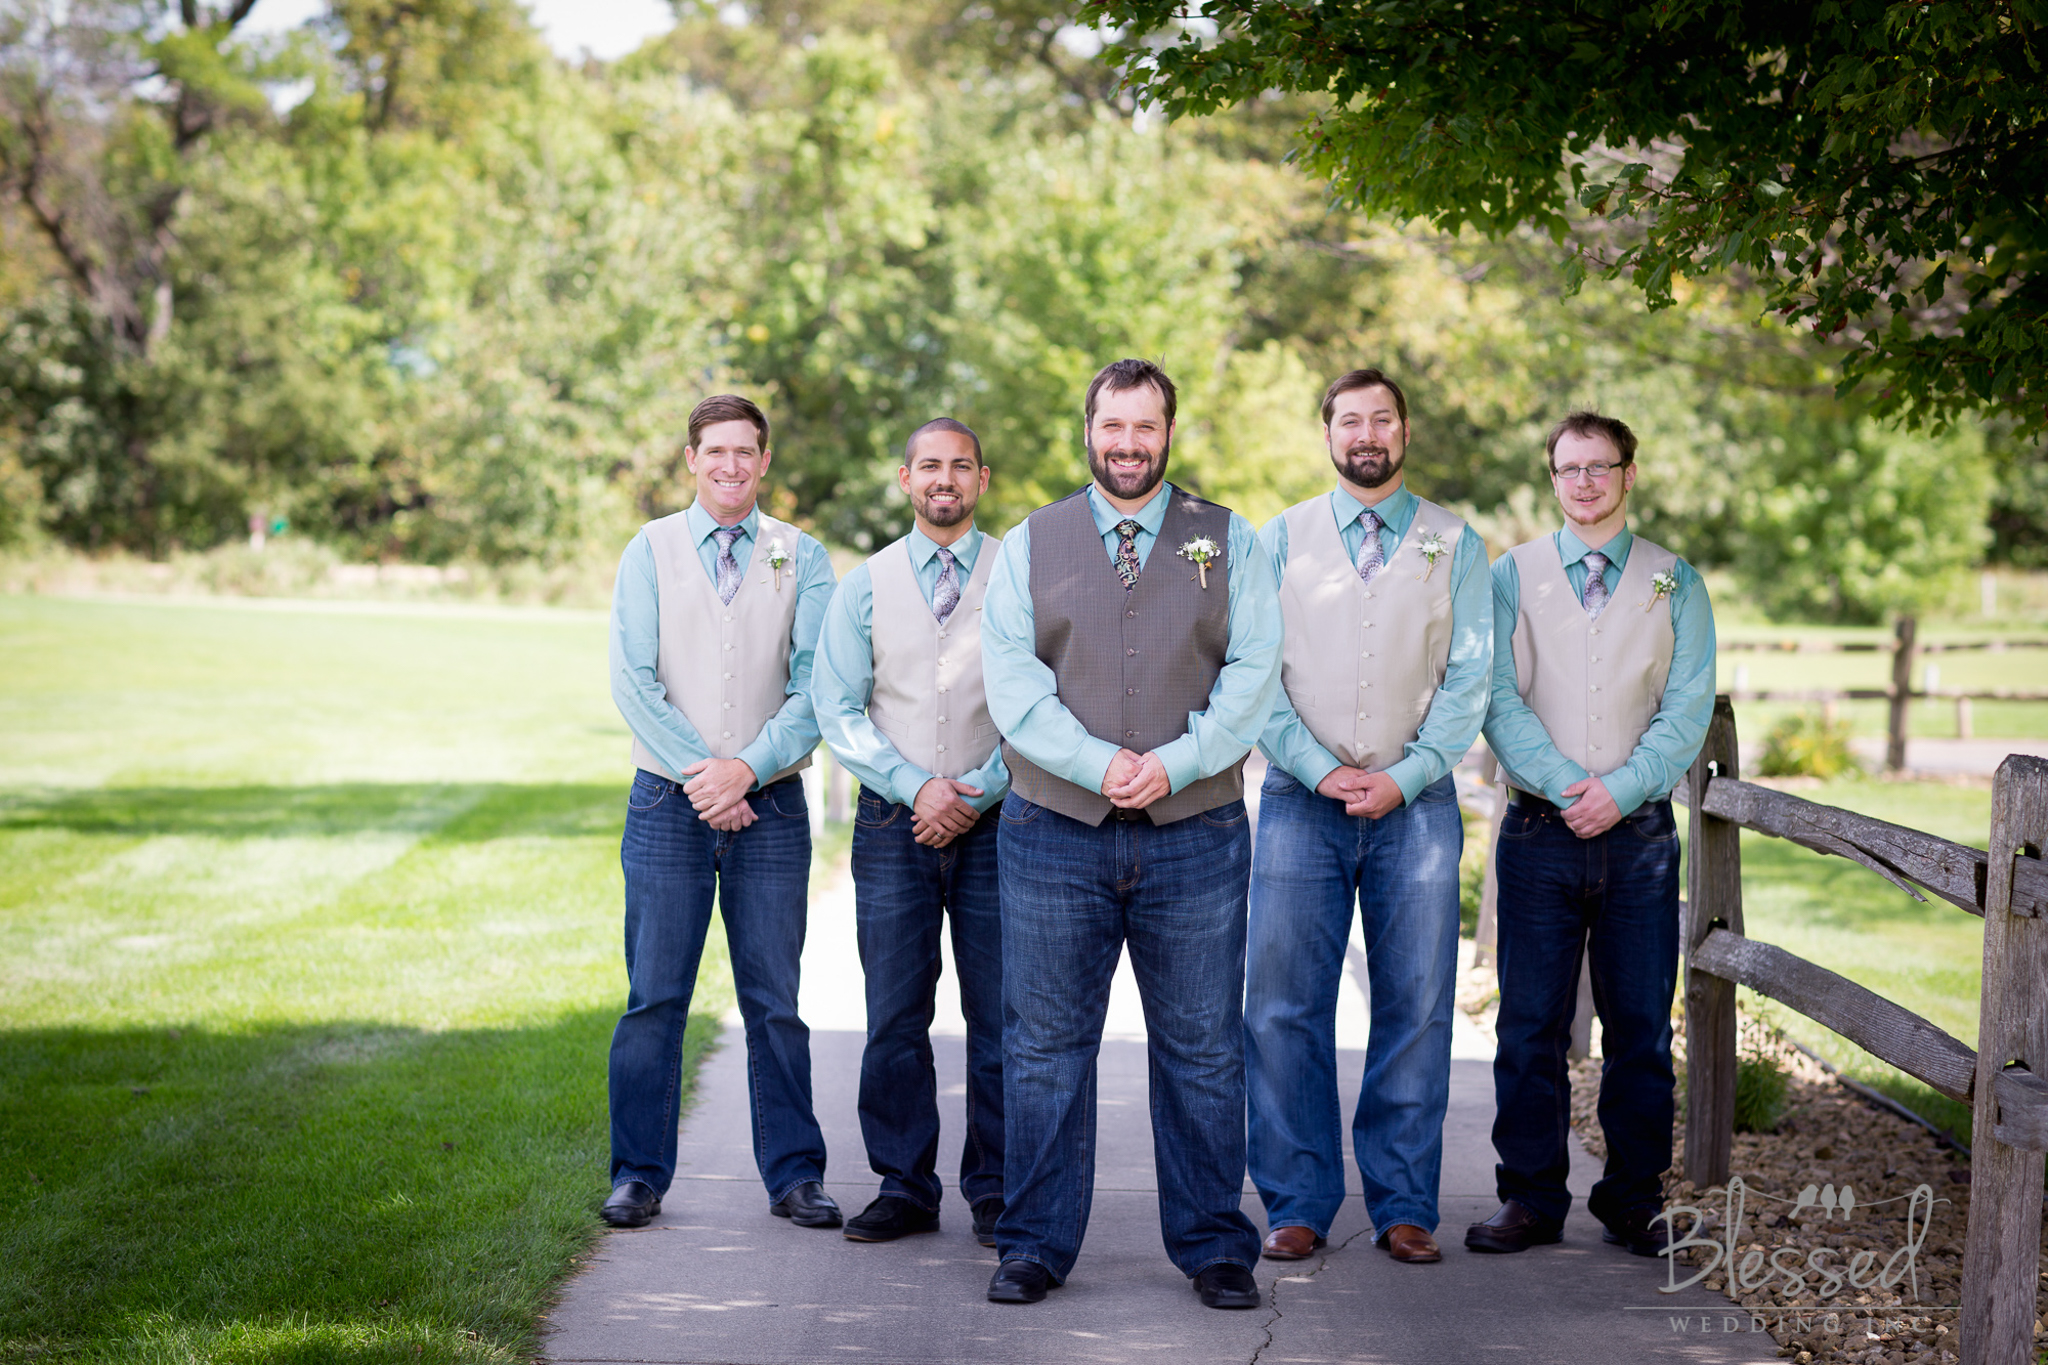 Destination Wedding Photography Minnesota By Blessed Wedding Photographers-12.jpg